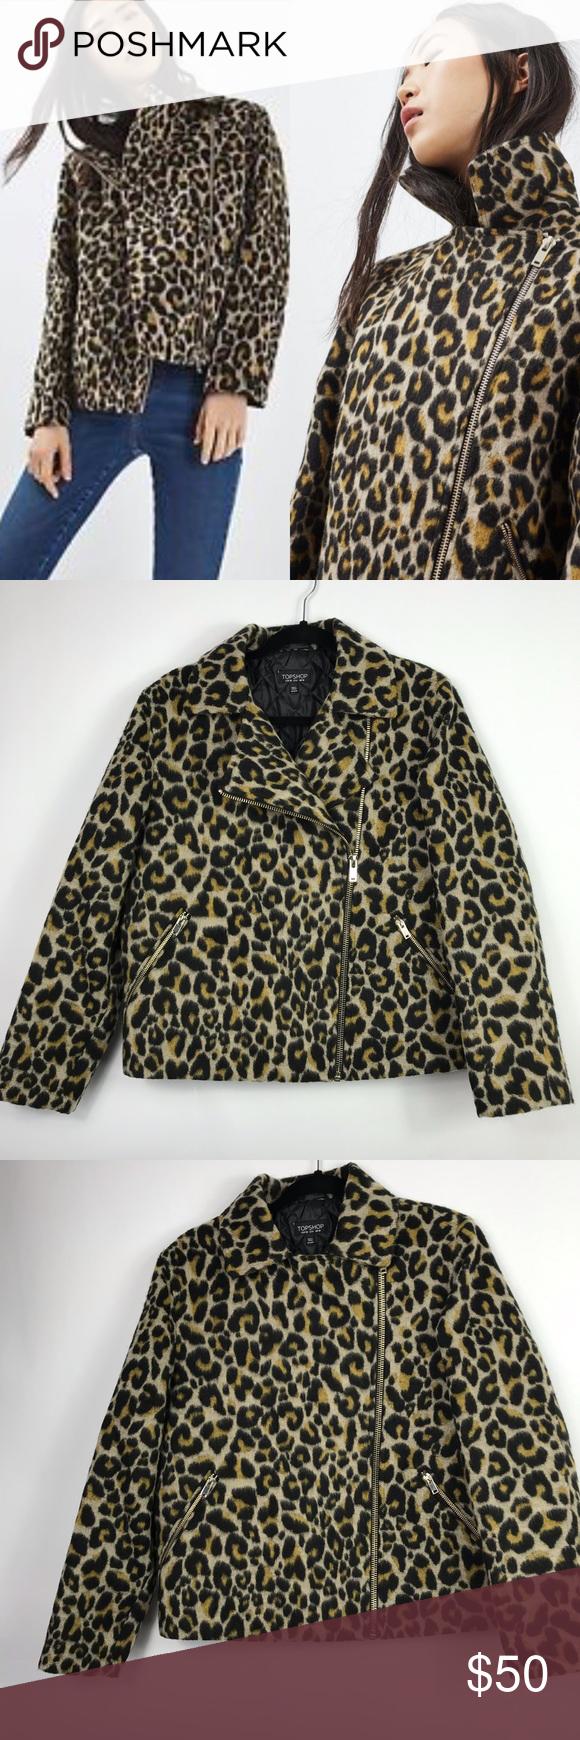 51a3daec4027 Topshop leopard print biker jacket The cutest leopard print moto jacket!  Wear with your favorite